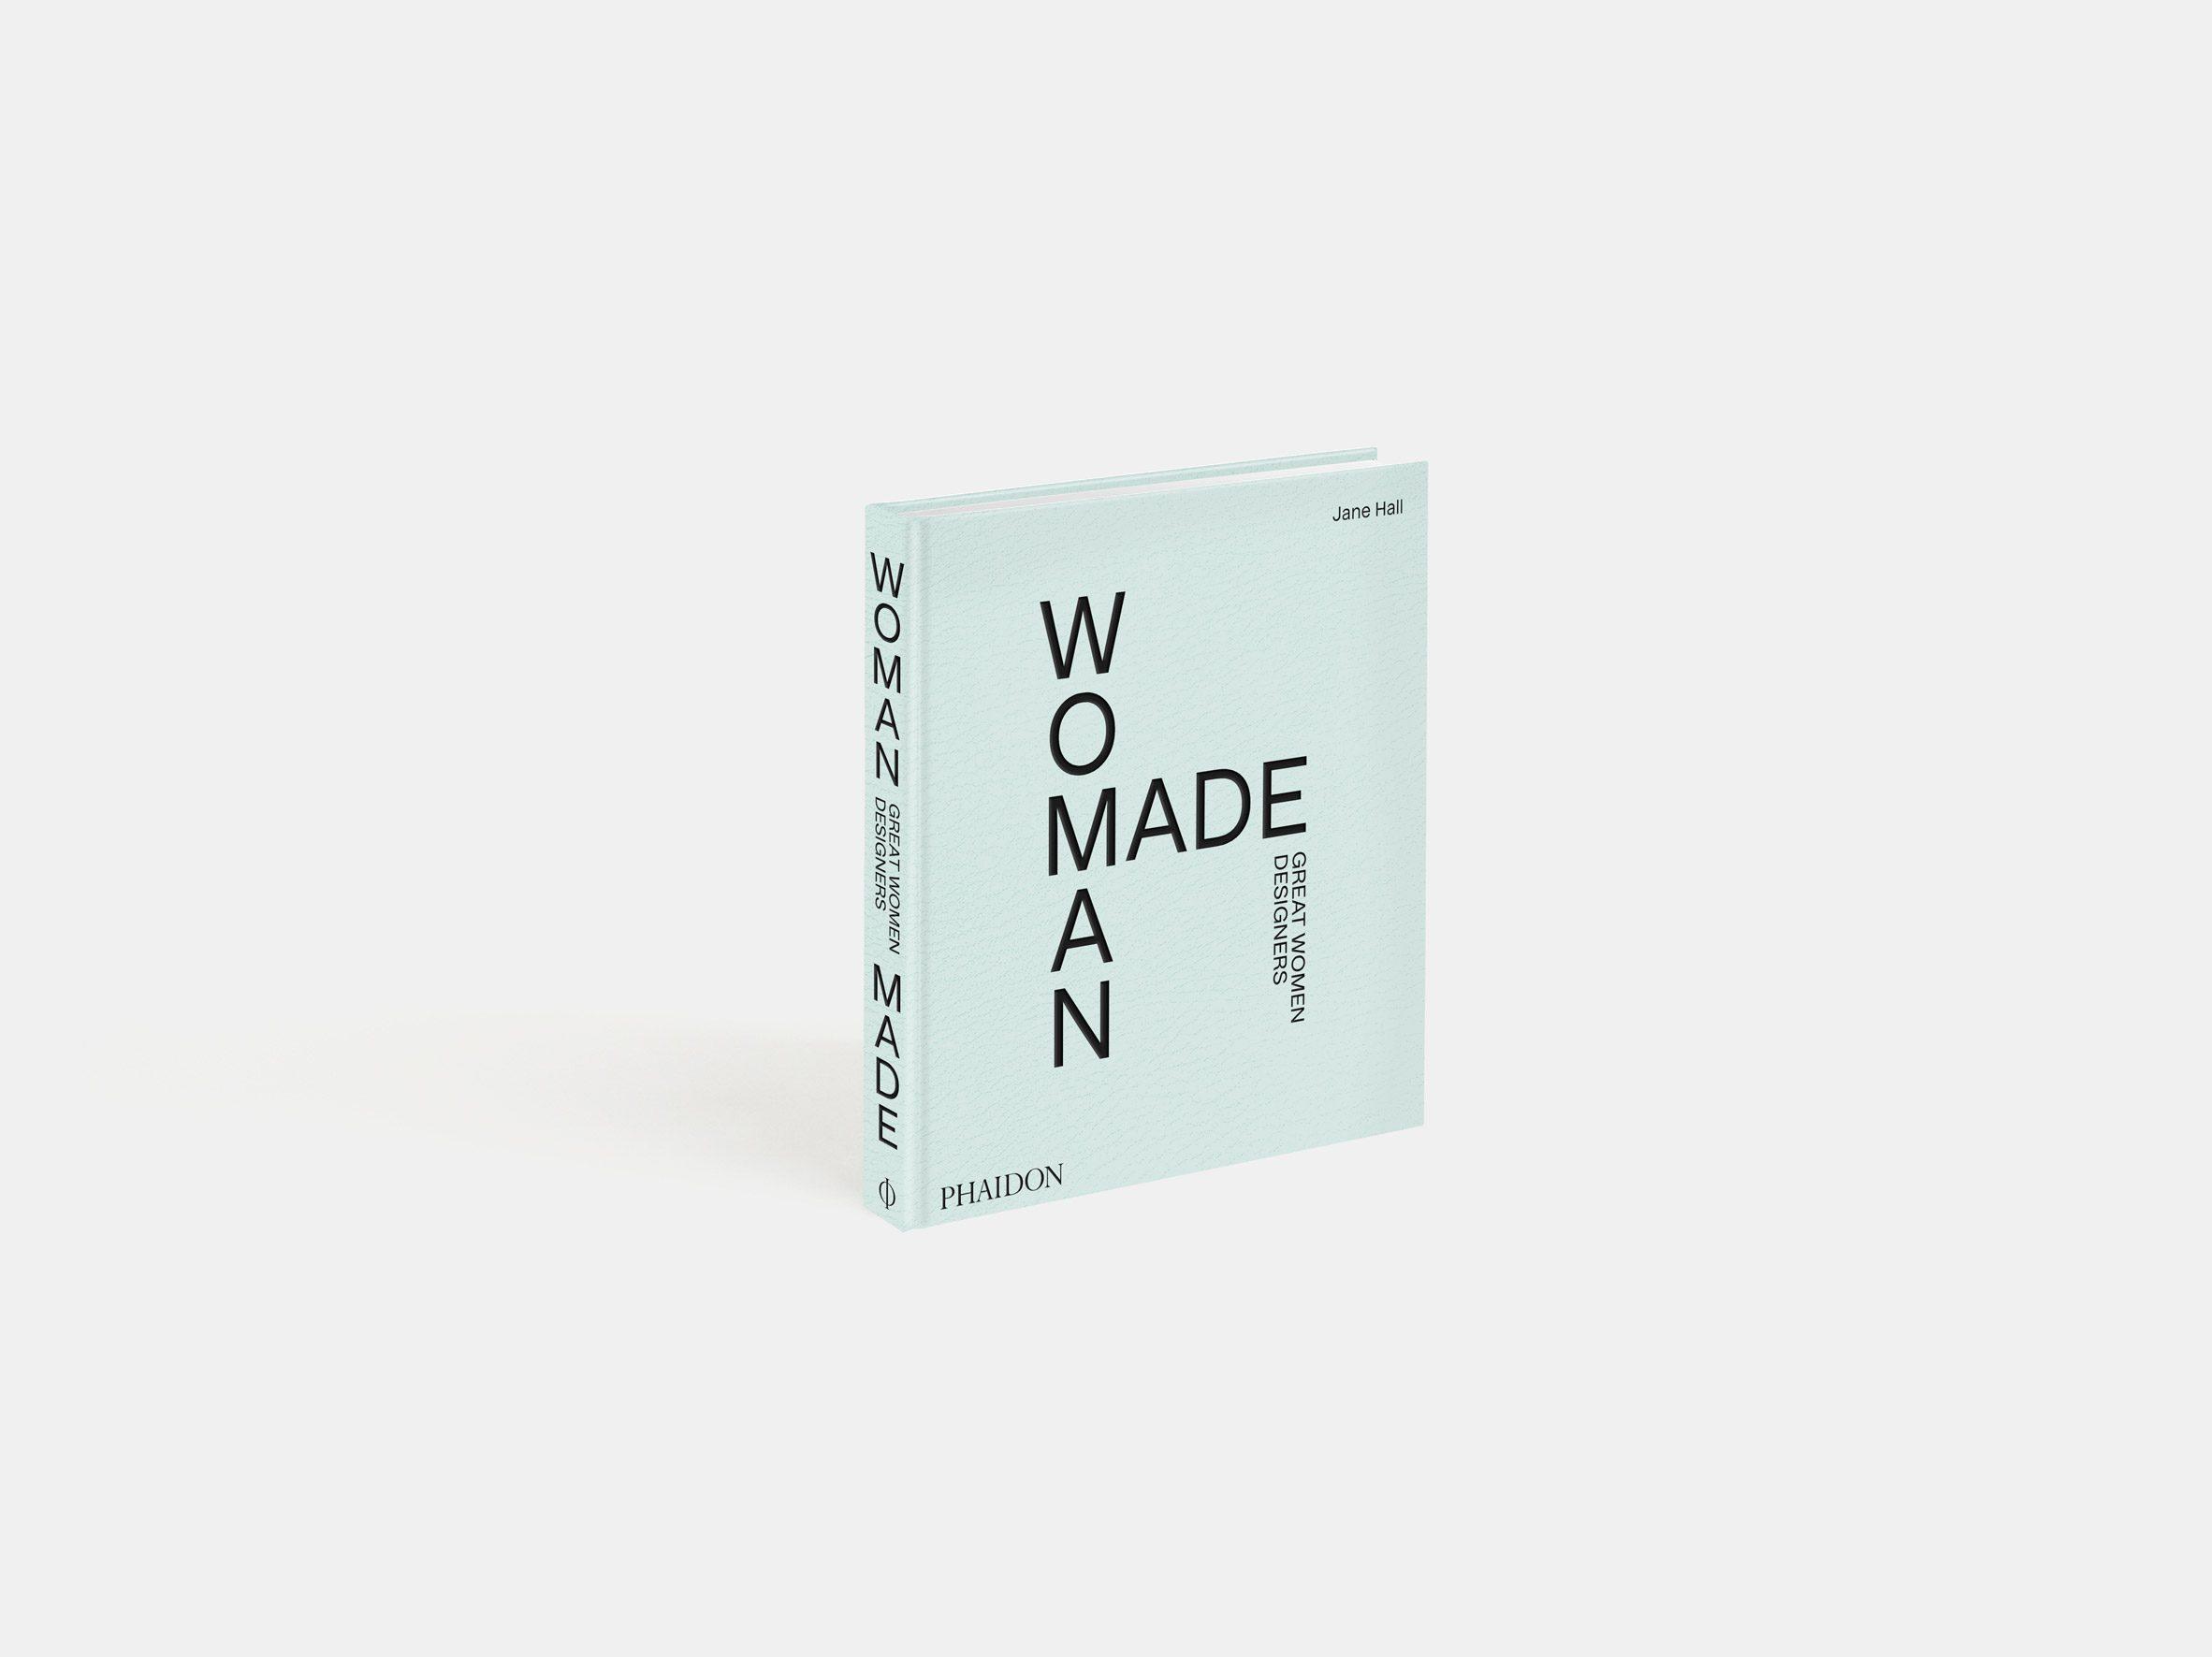 The book celebrates woman designers over the last century